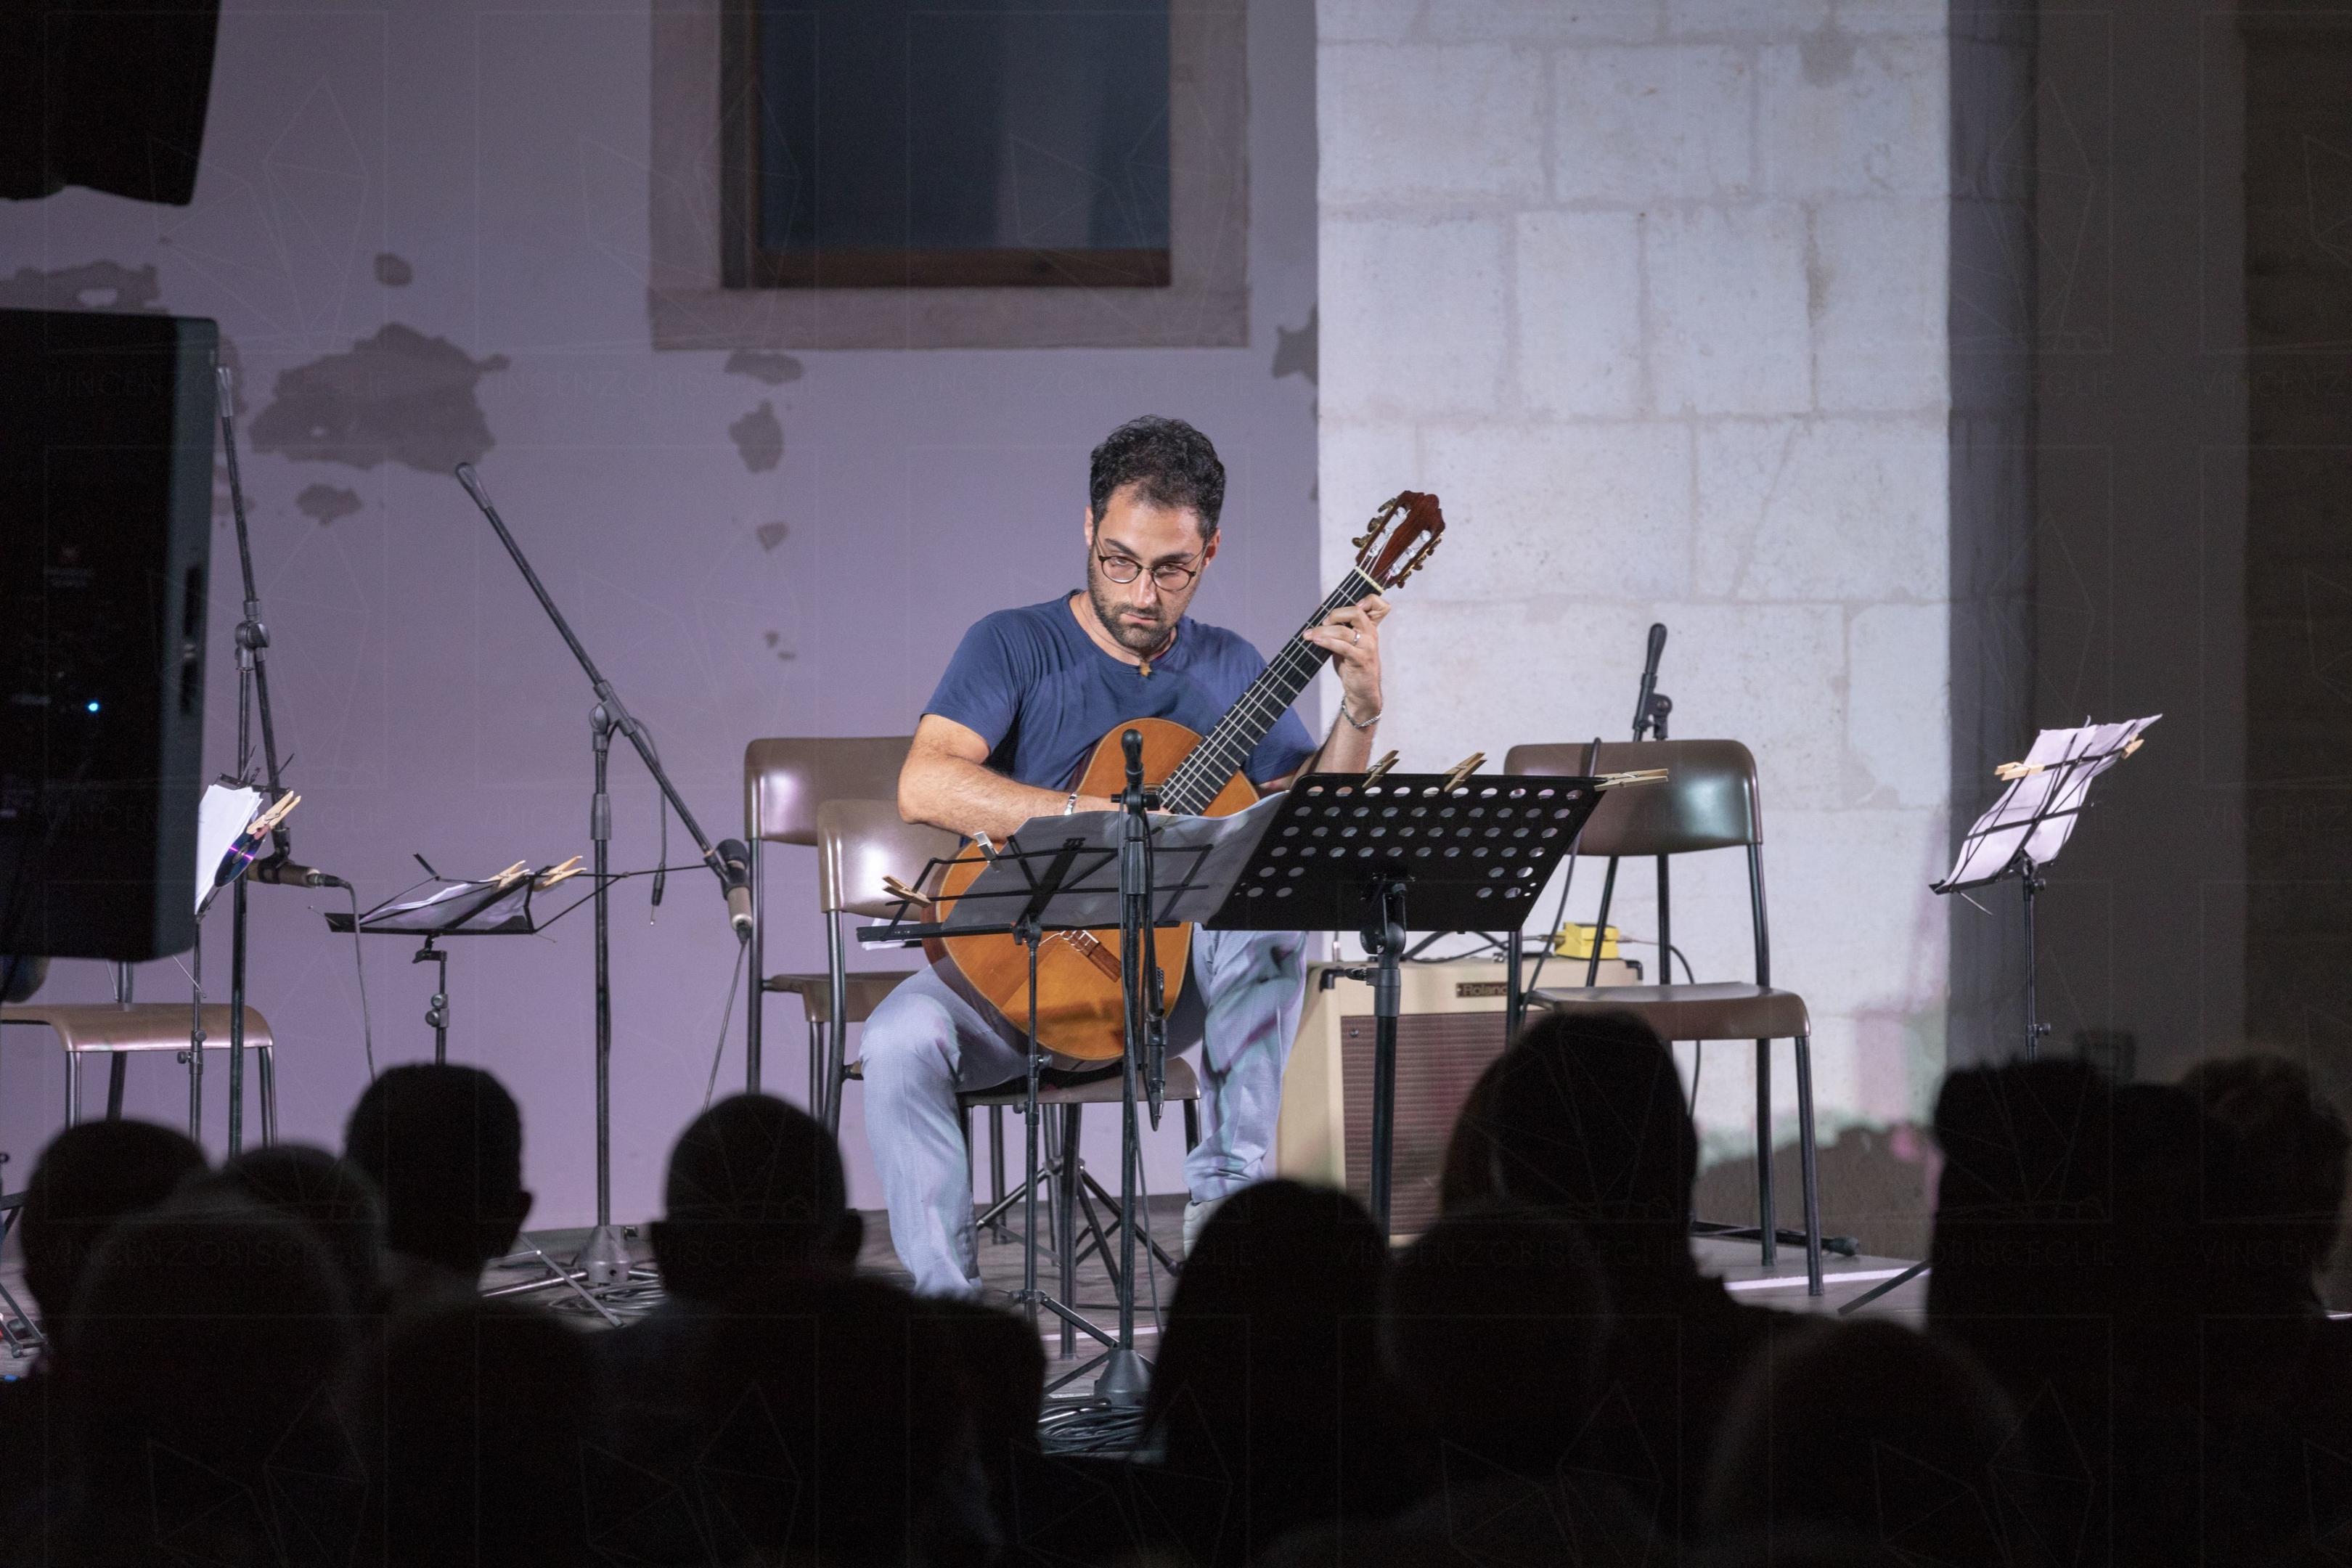 Sergio Altamura - Vito Vilardi - Sabino de Bari - Joe Valeriano - Marco Corcella - Nicola Nesta